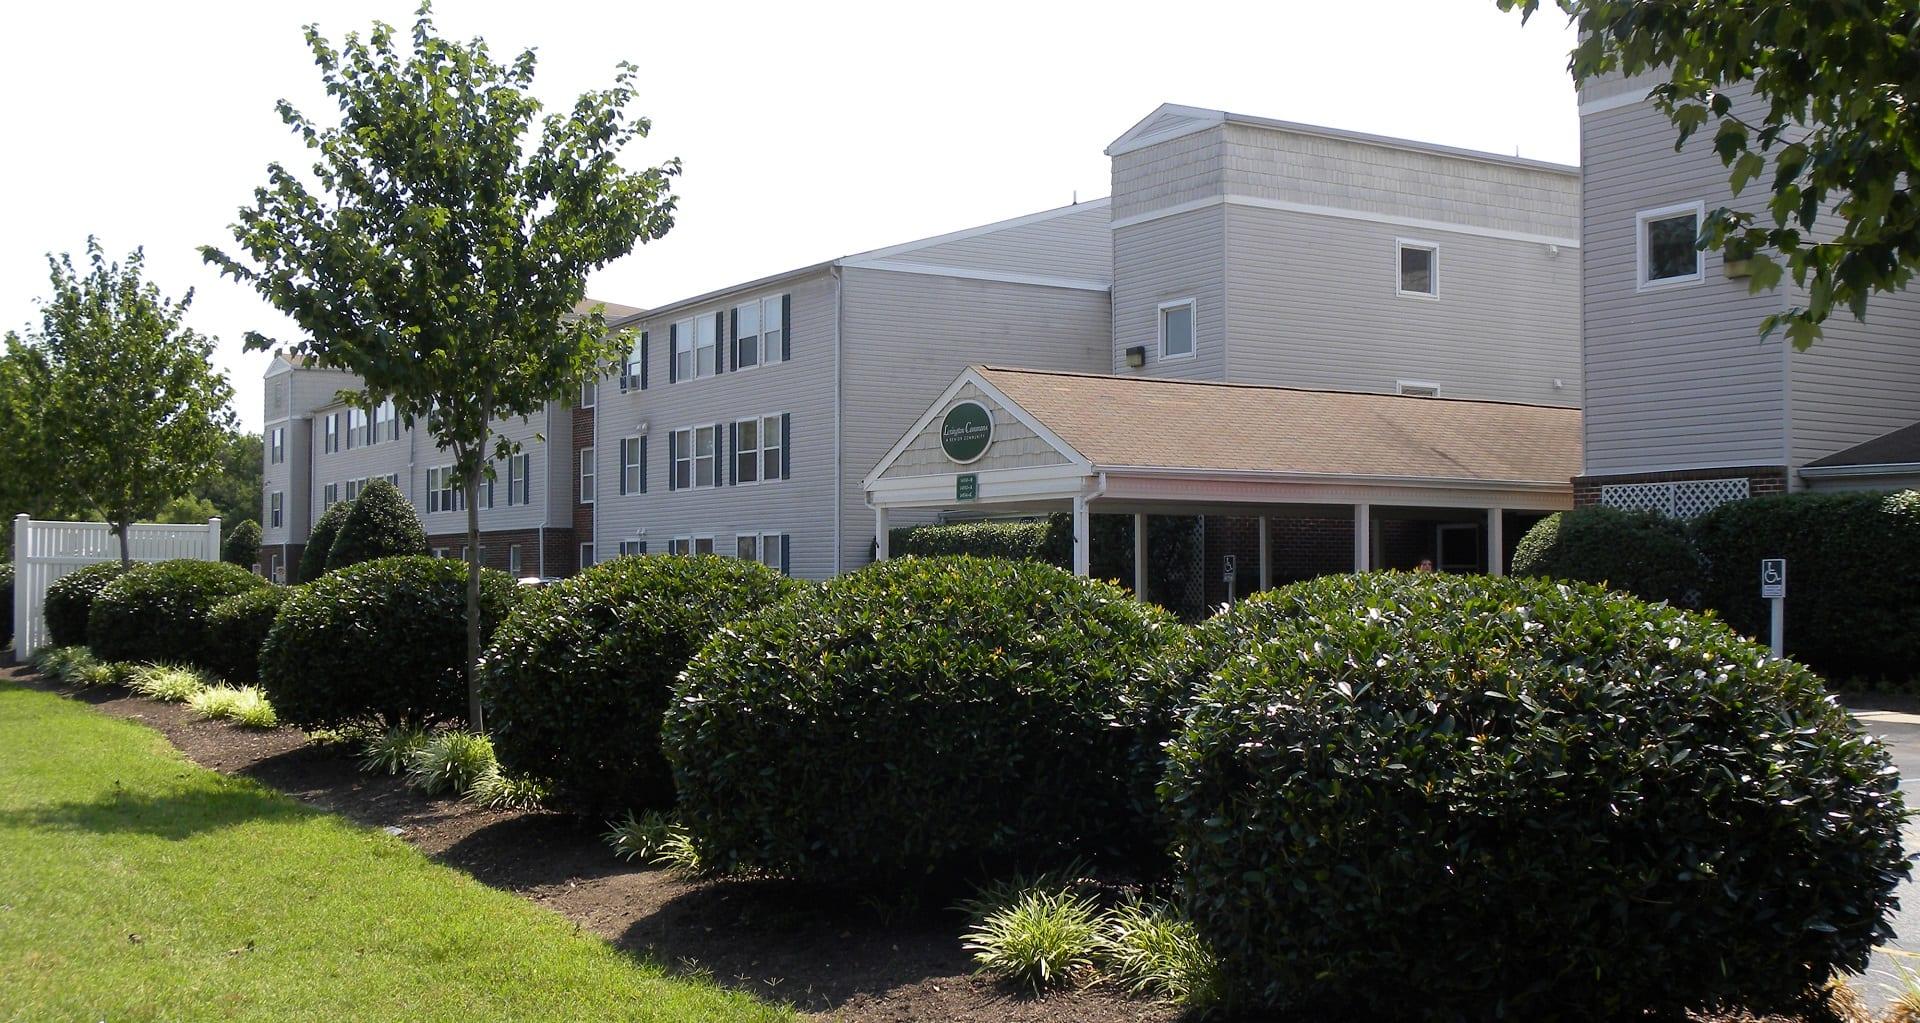 Lexington Commons 55+ Community in Newport News, VA